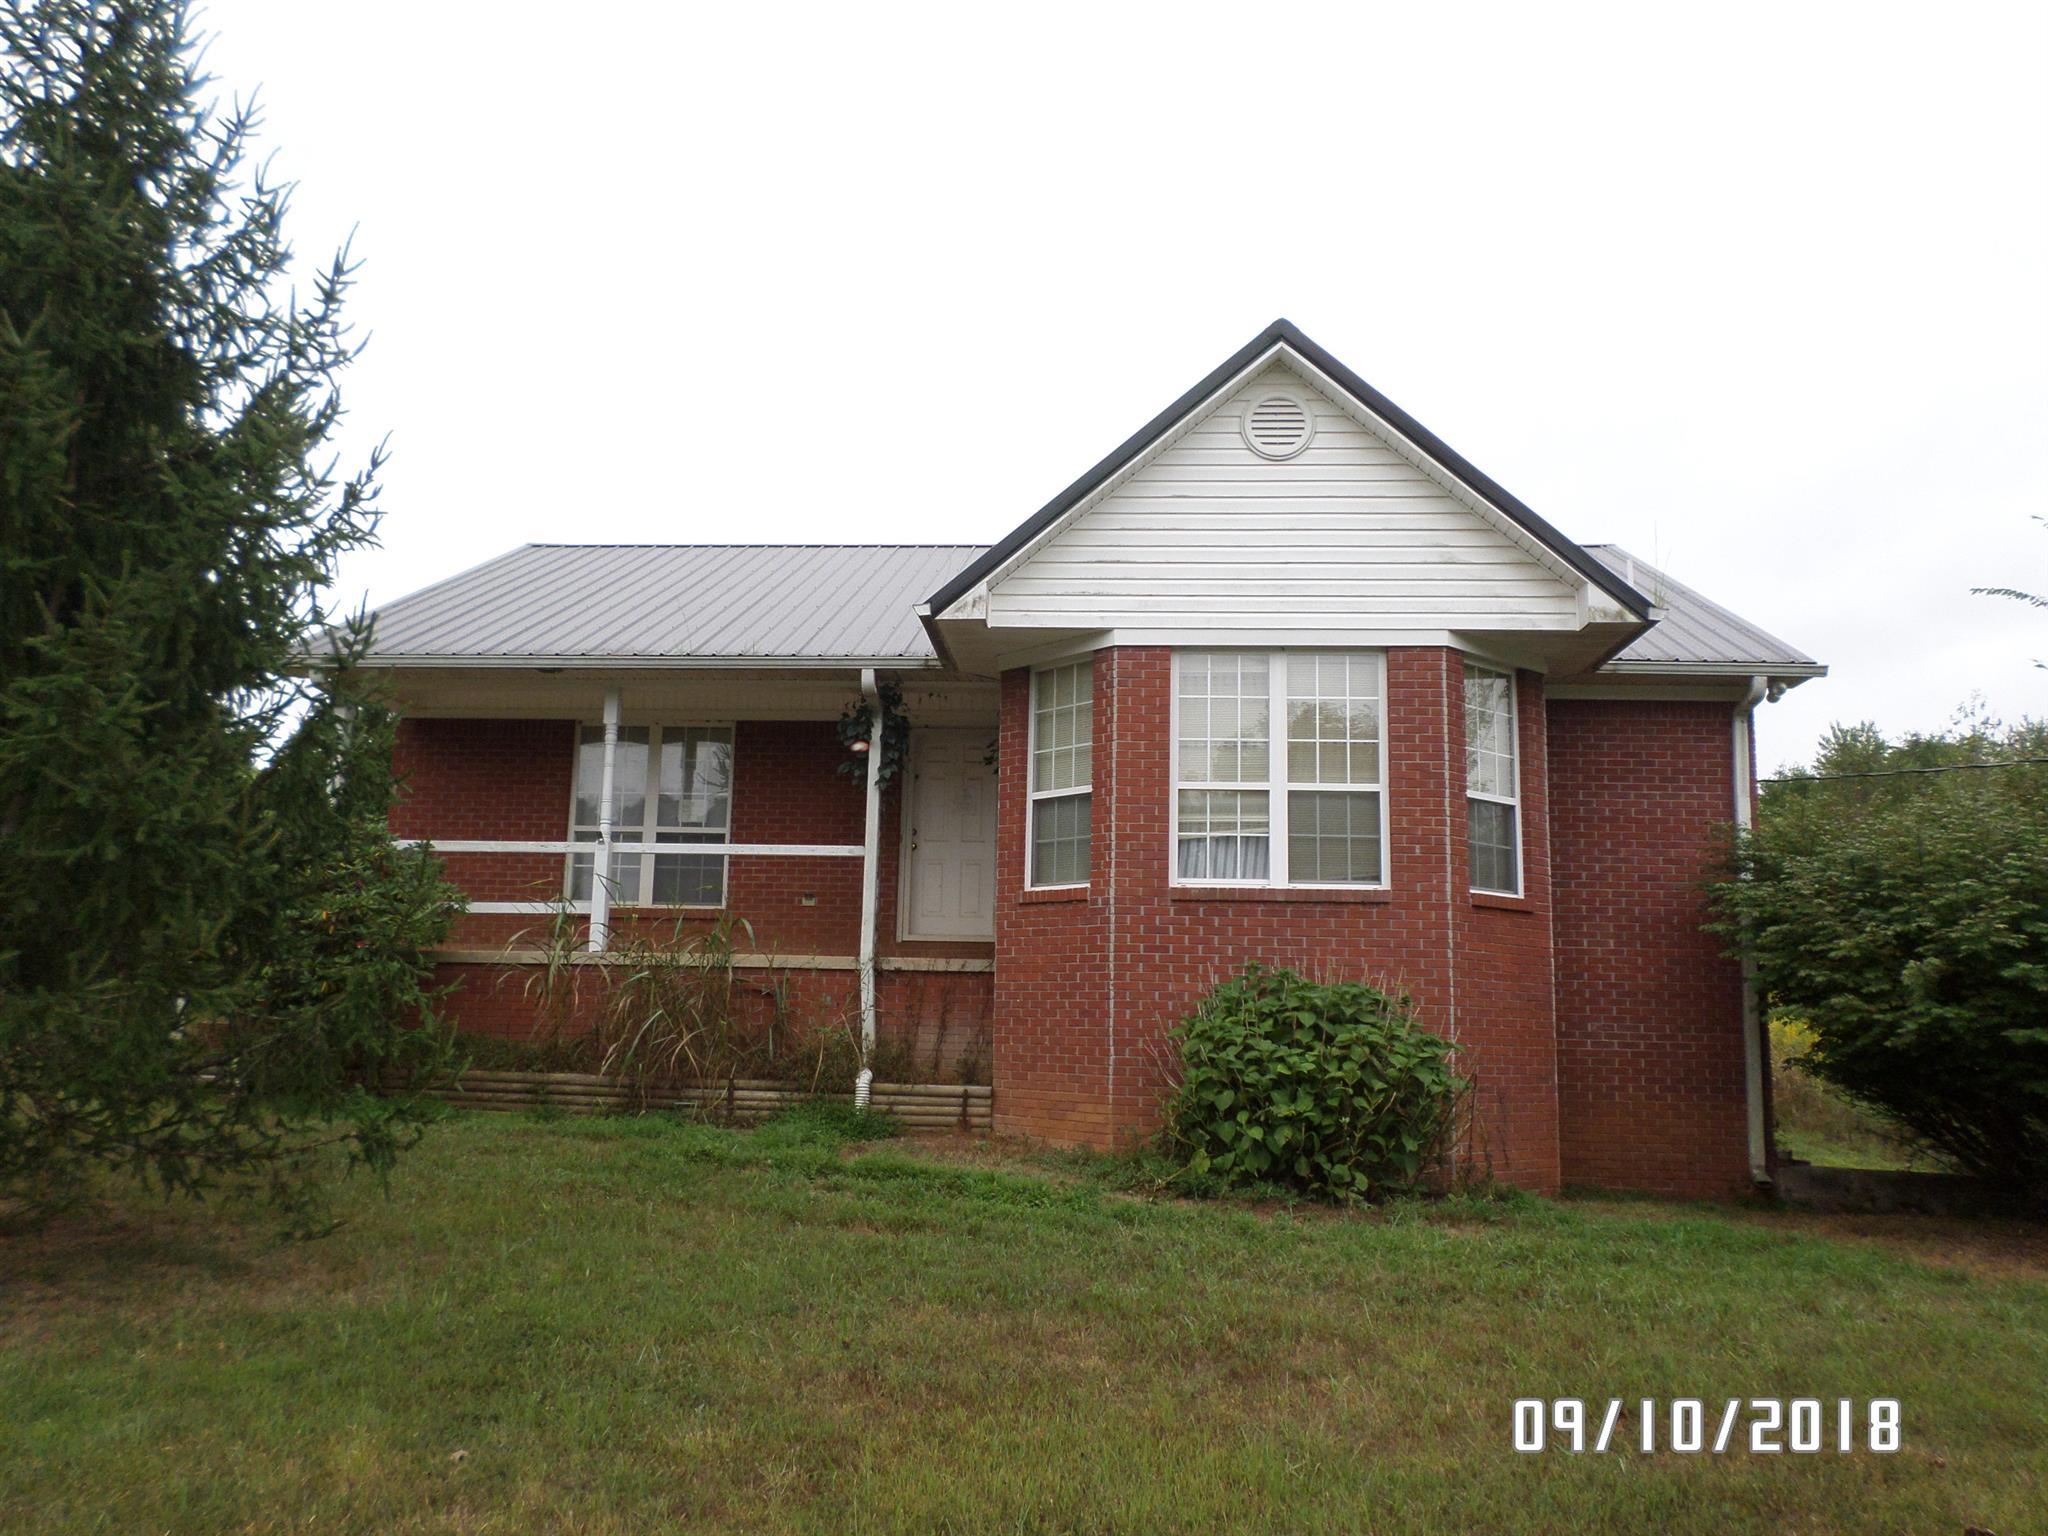 265 Collinwood Rd Westpoint, TN 38486